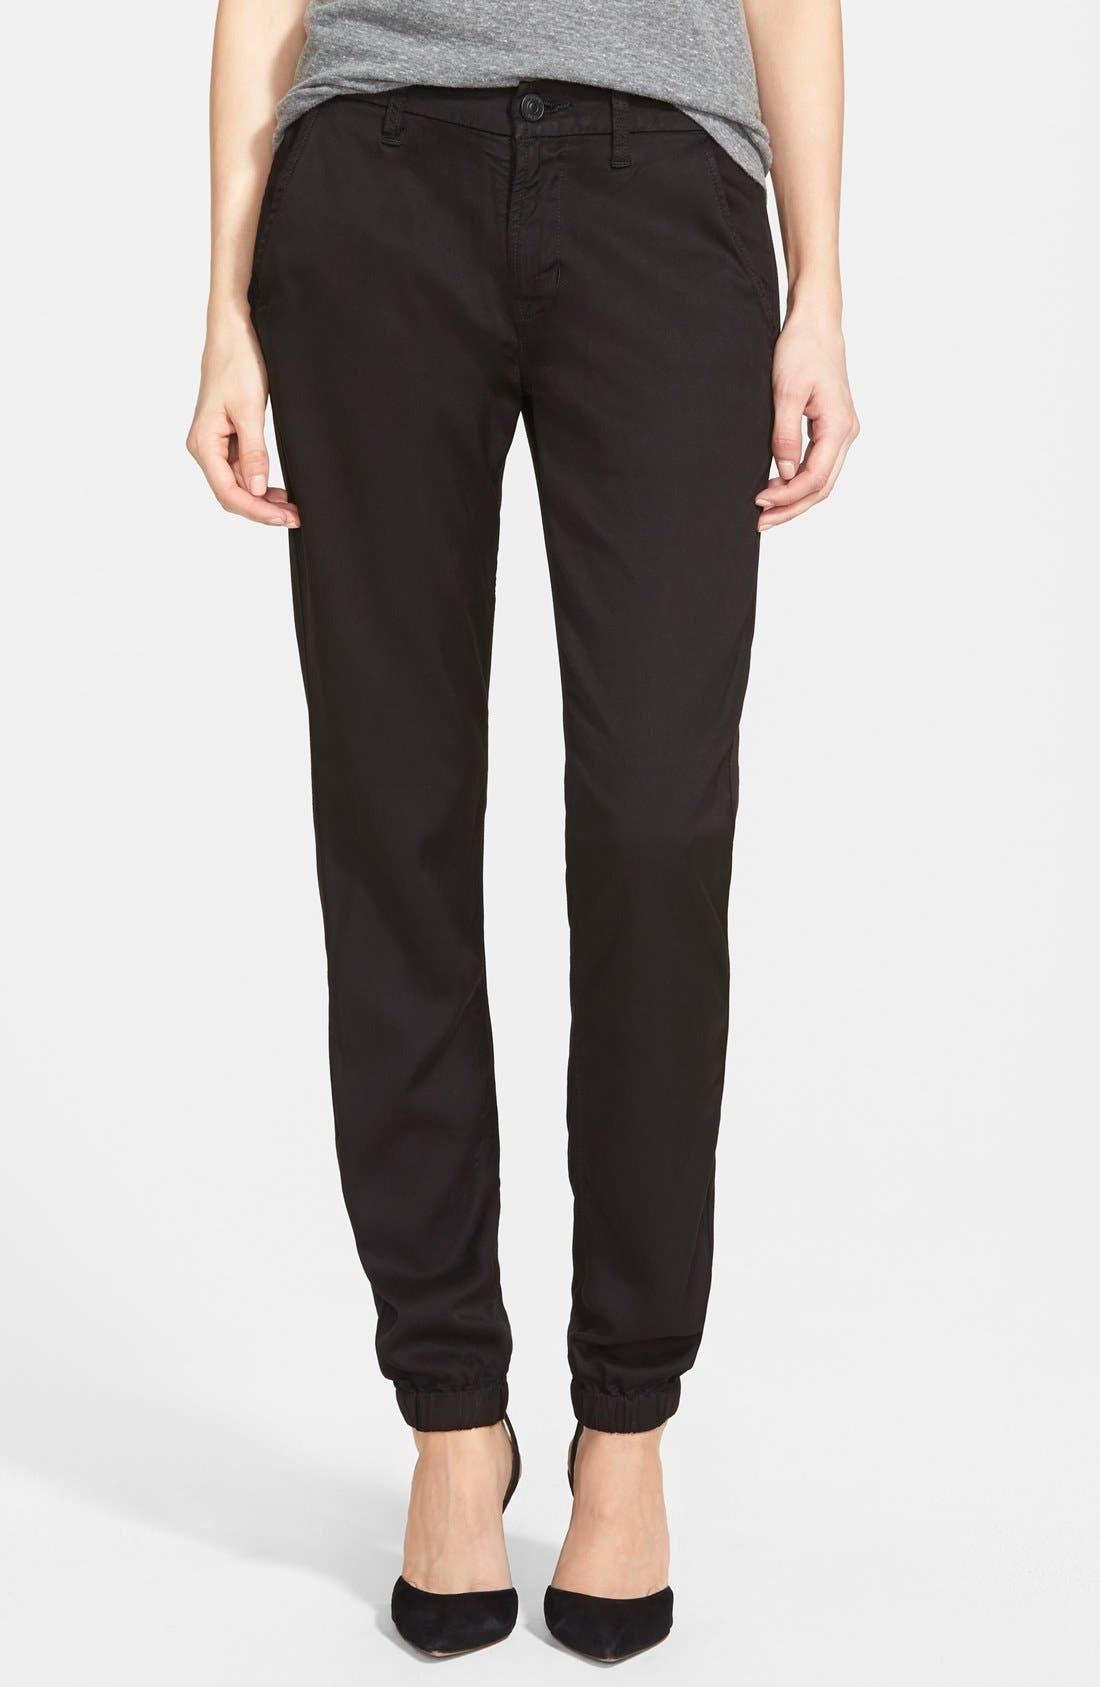 HUDSON JEANS 'Vanish' Plaid Chino Pants, Main, color, 001